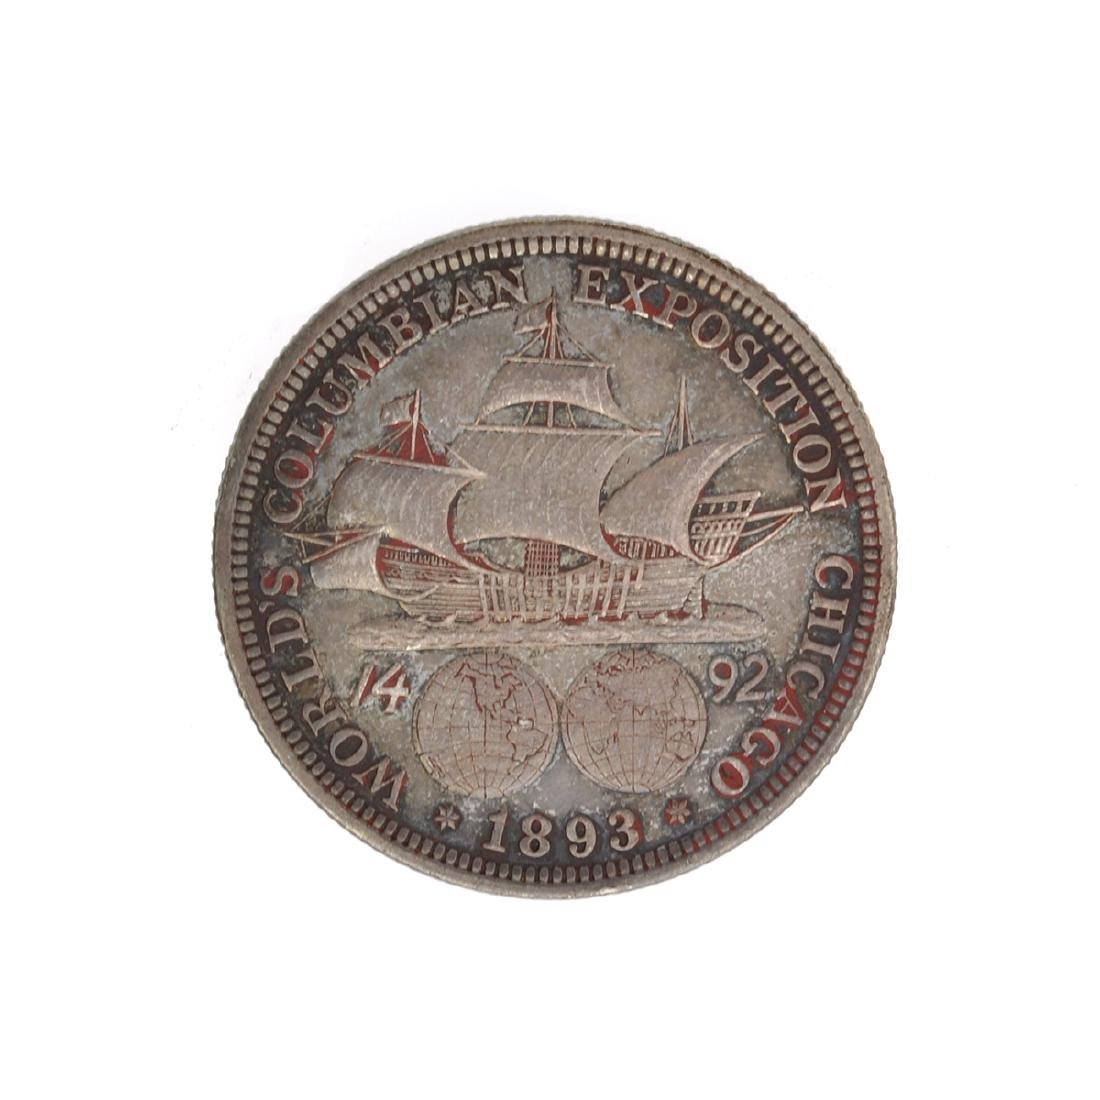 1893 Columbian Commemorative  Half Dollar Coin - 2